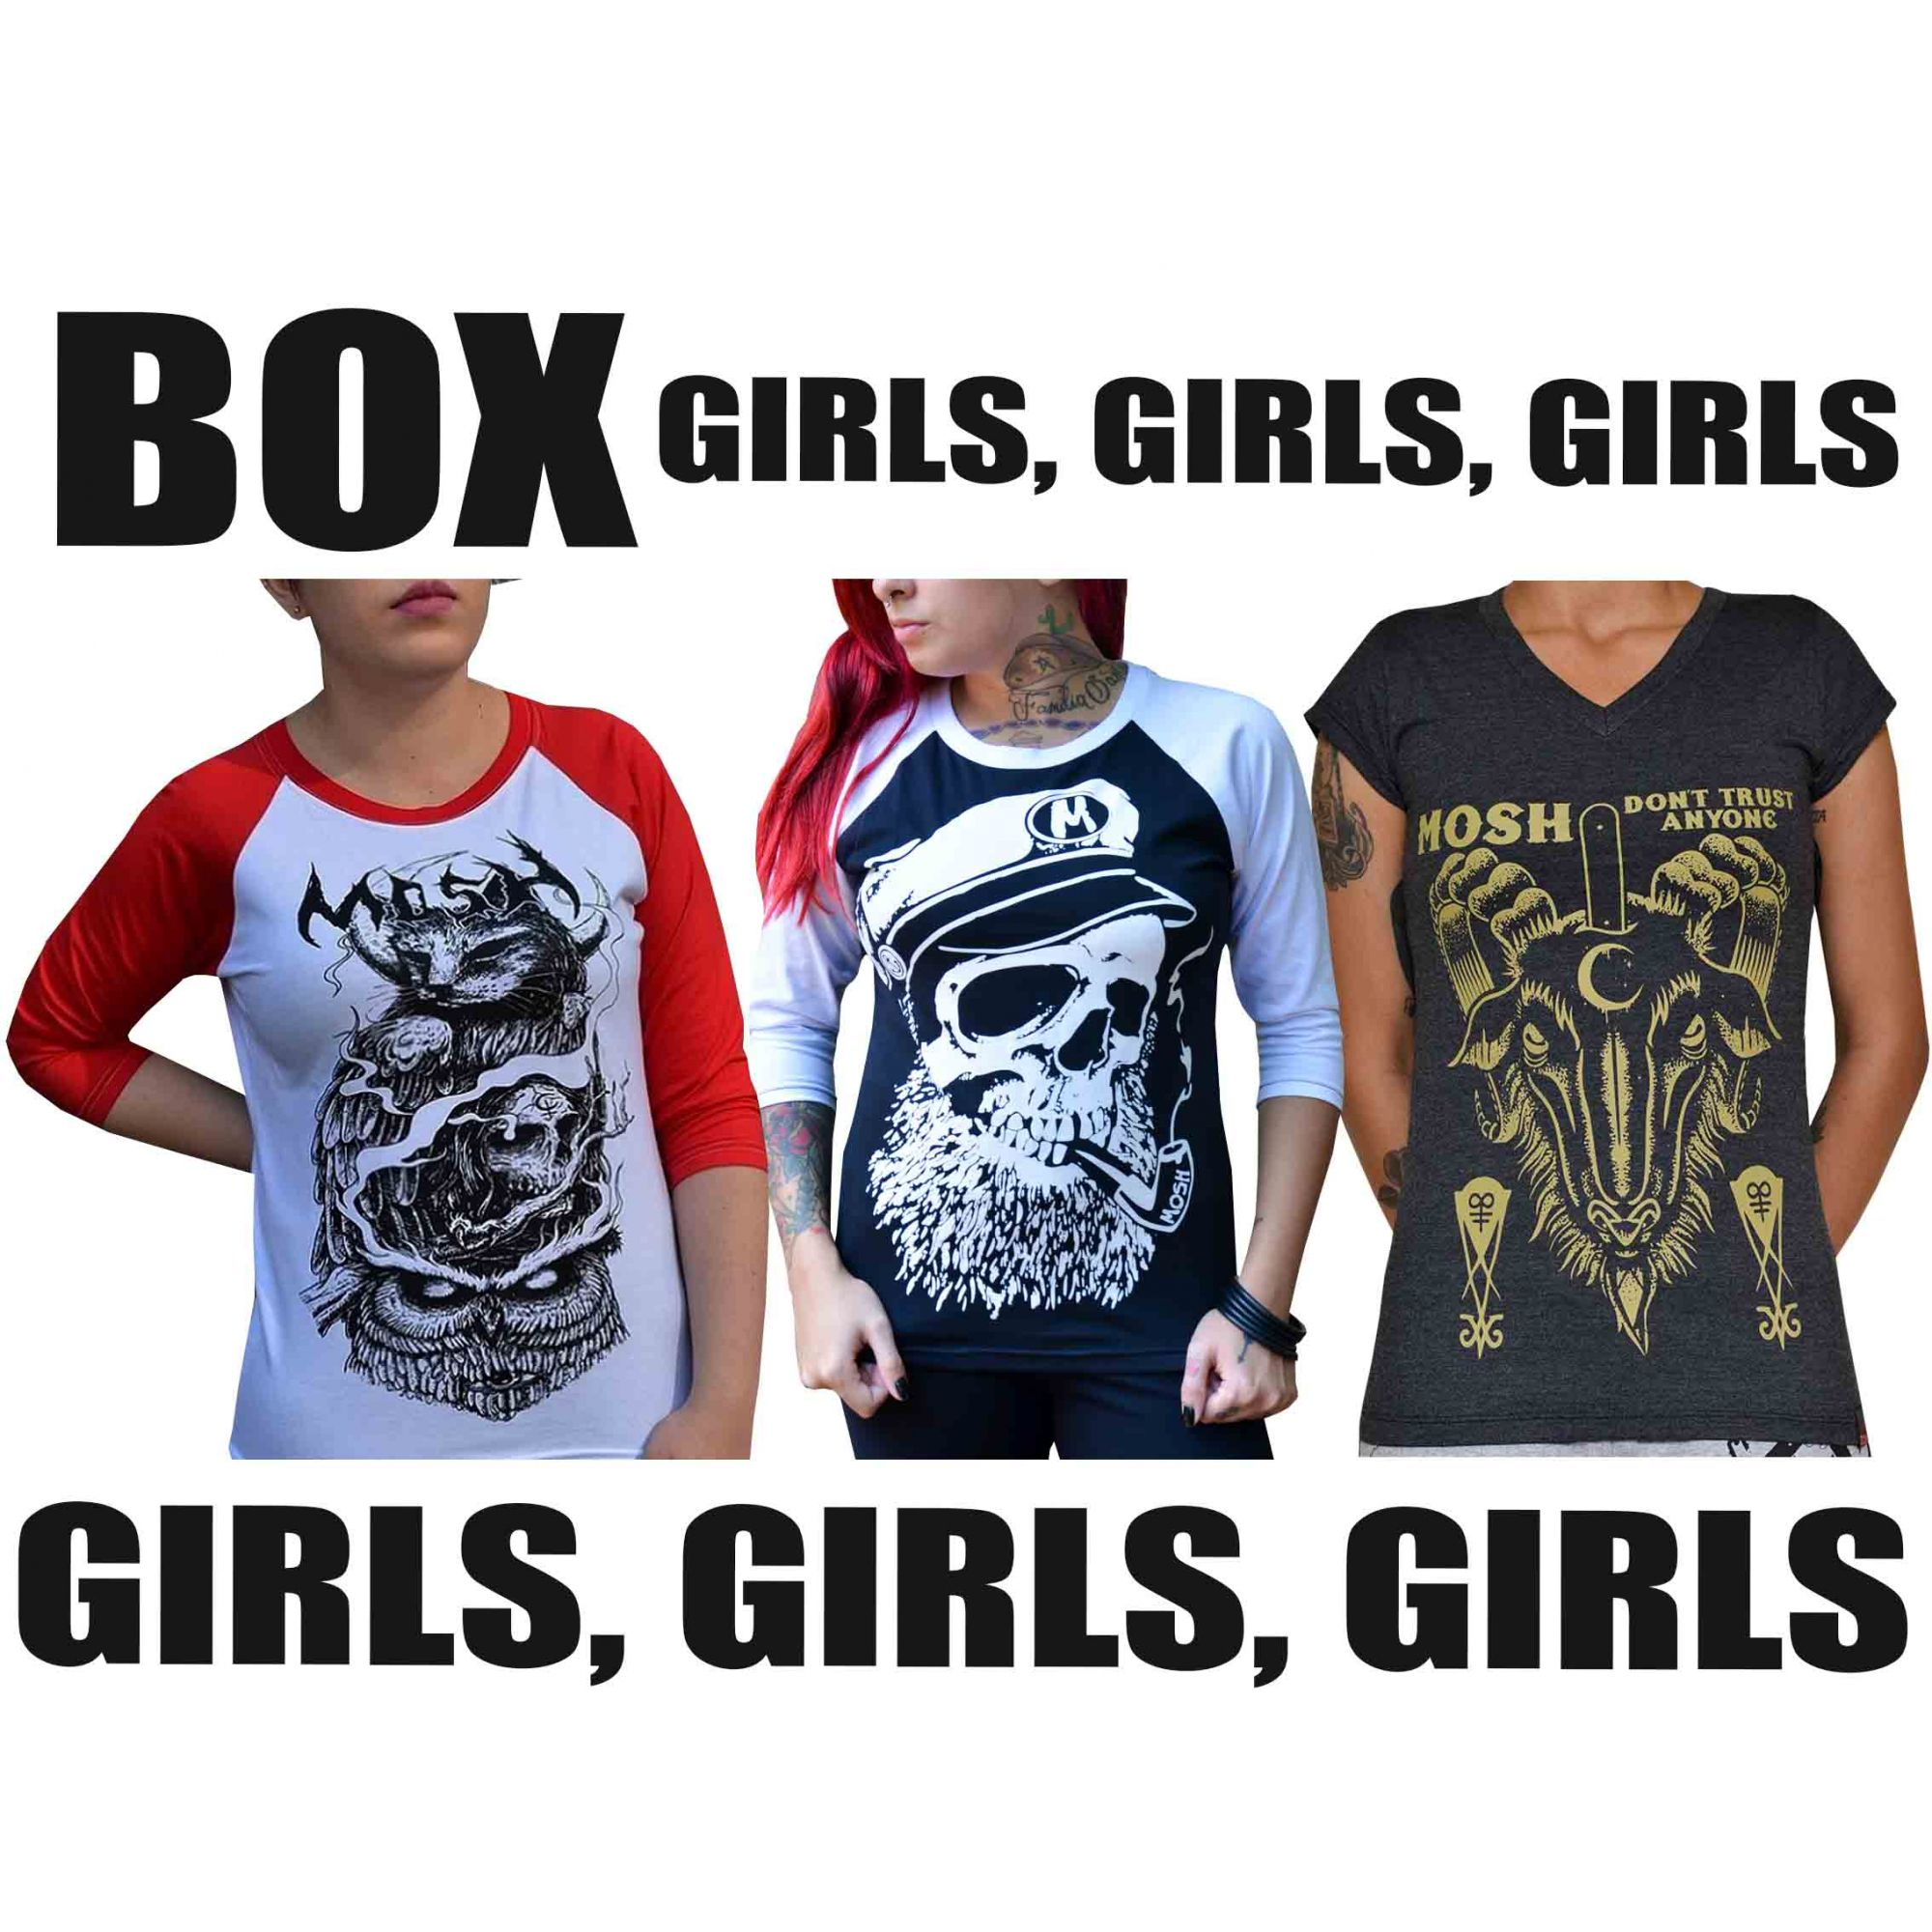 BOX GIRLS, GIRLS, GIRLS